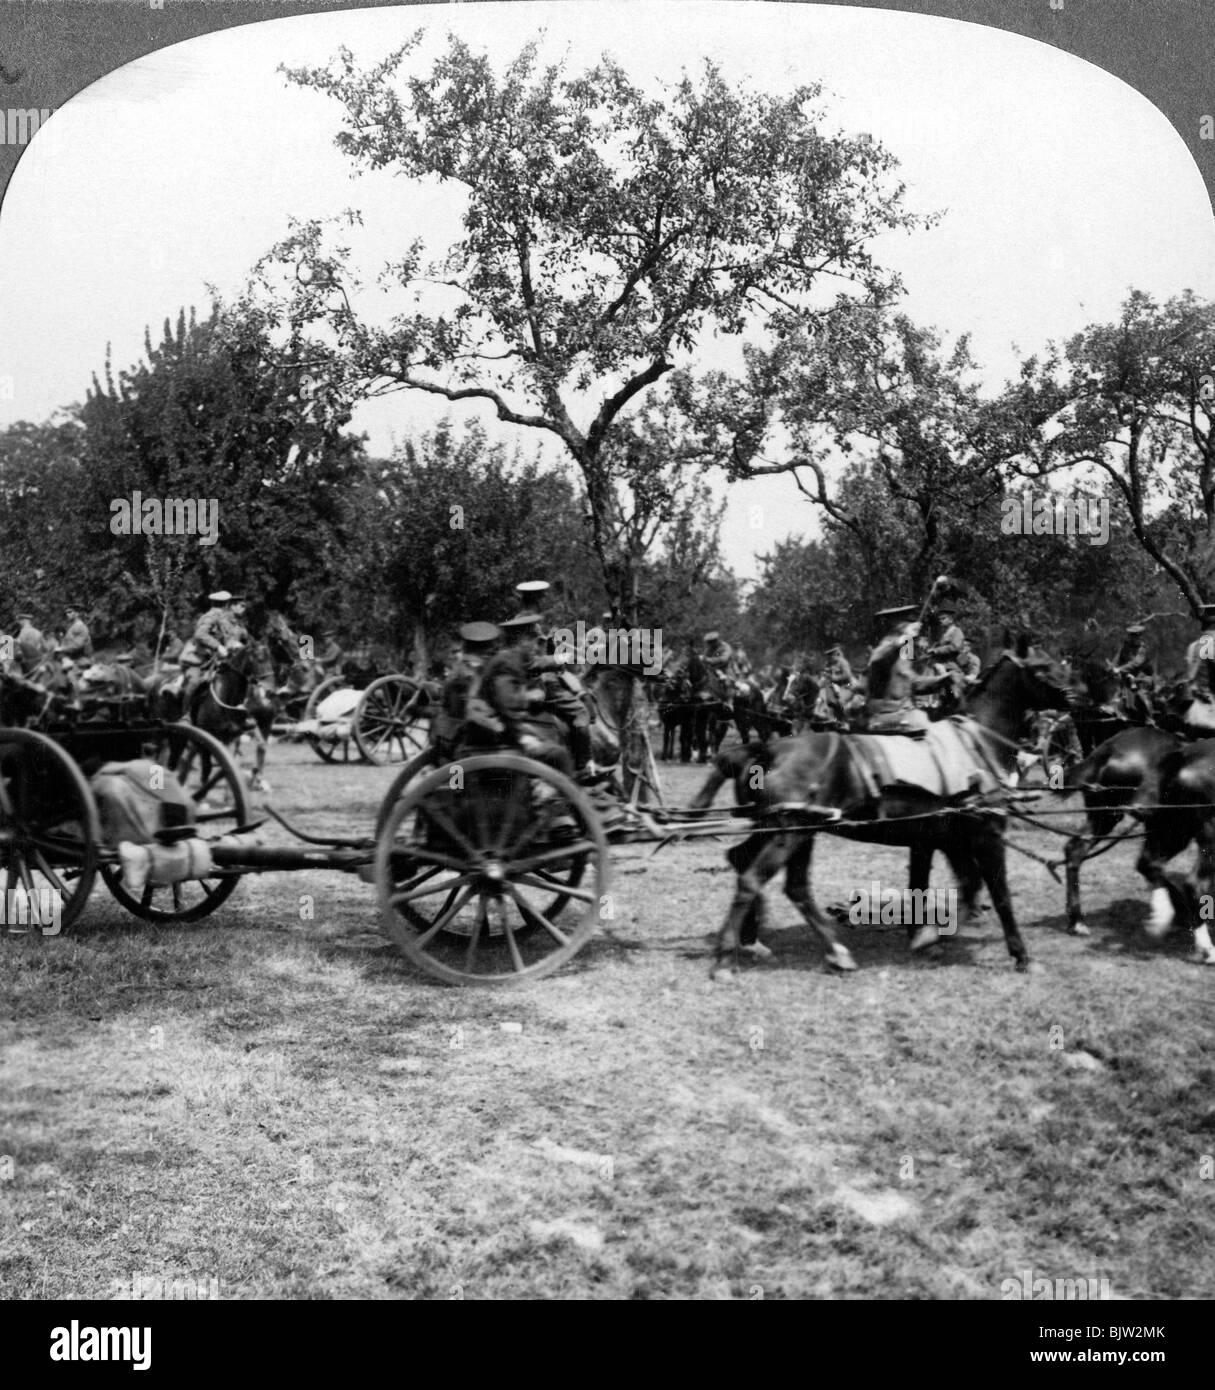 Horse-drawn artillery, World War I, 1914-1918. - Stock Image